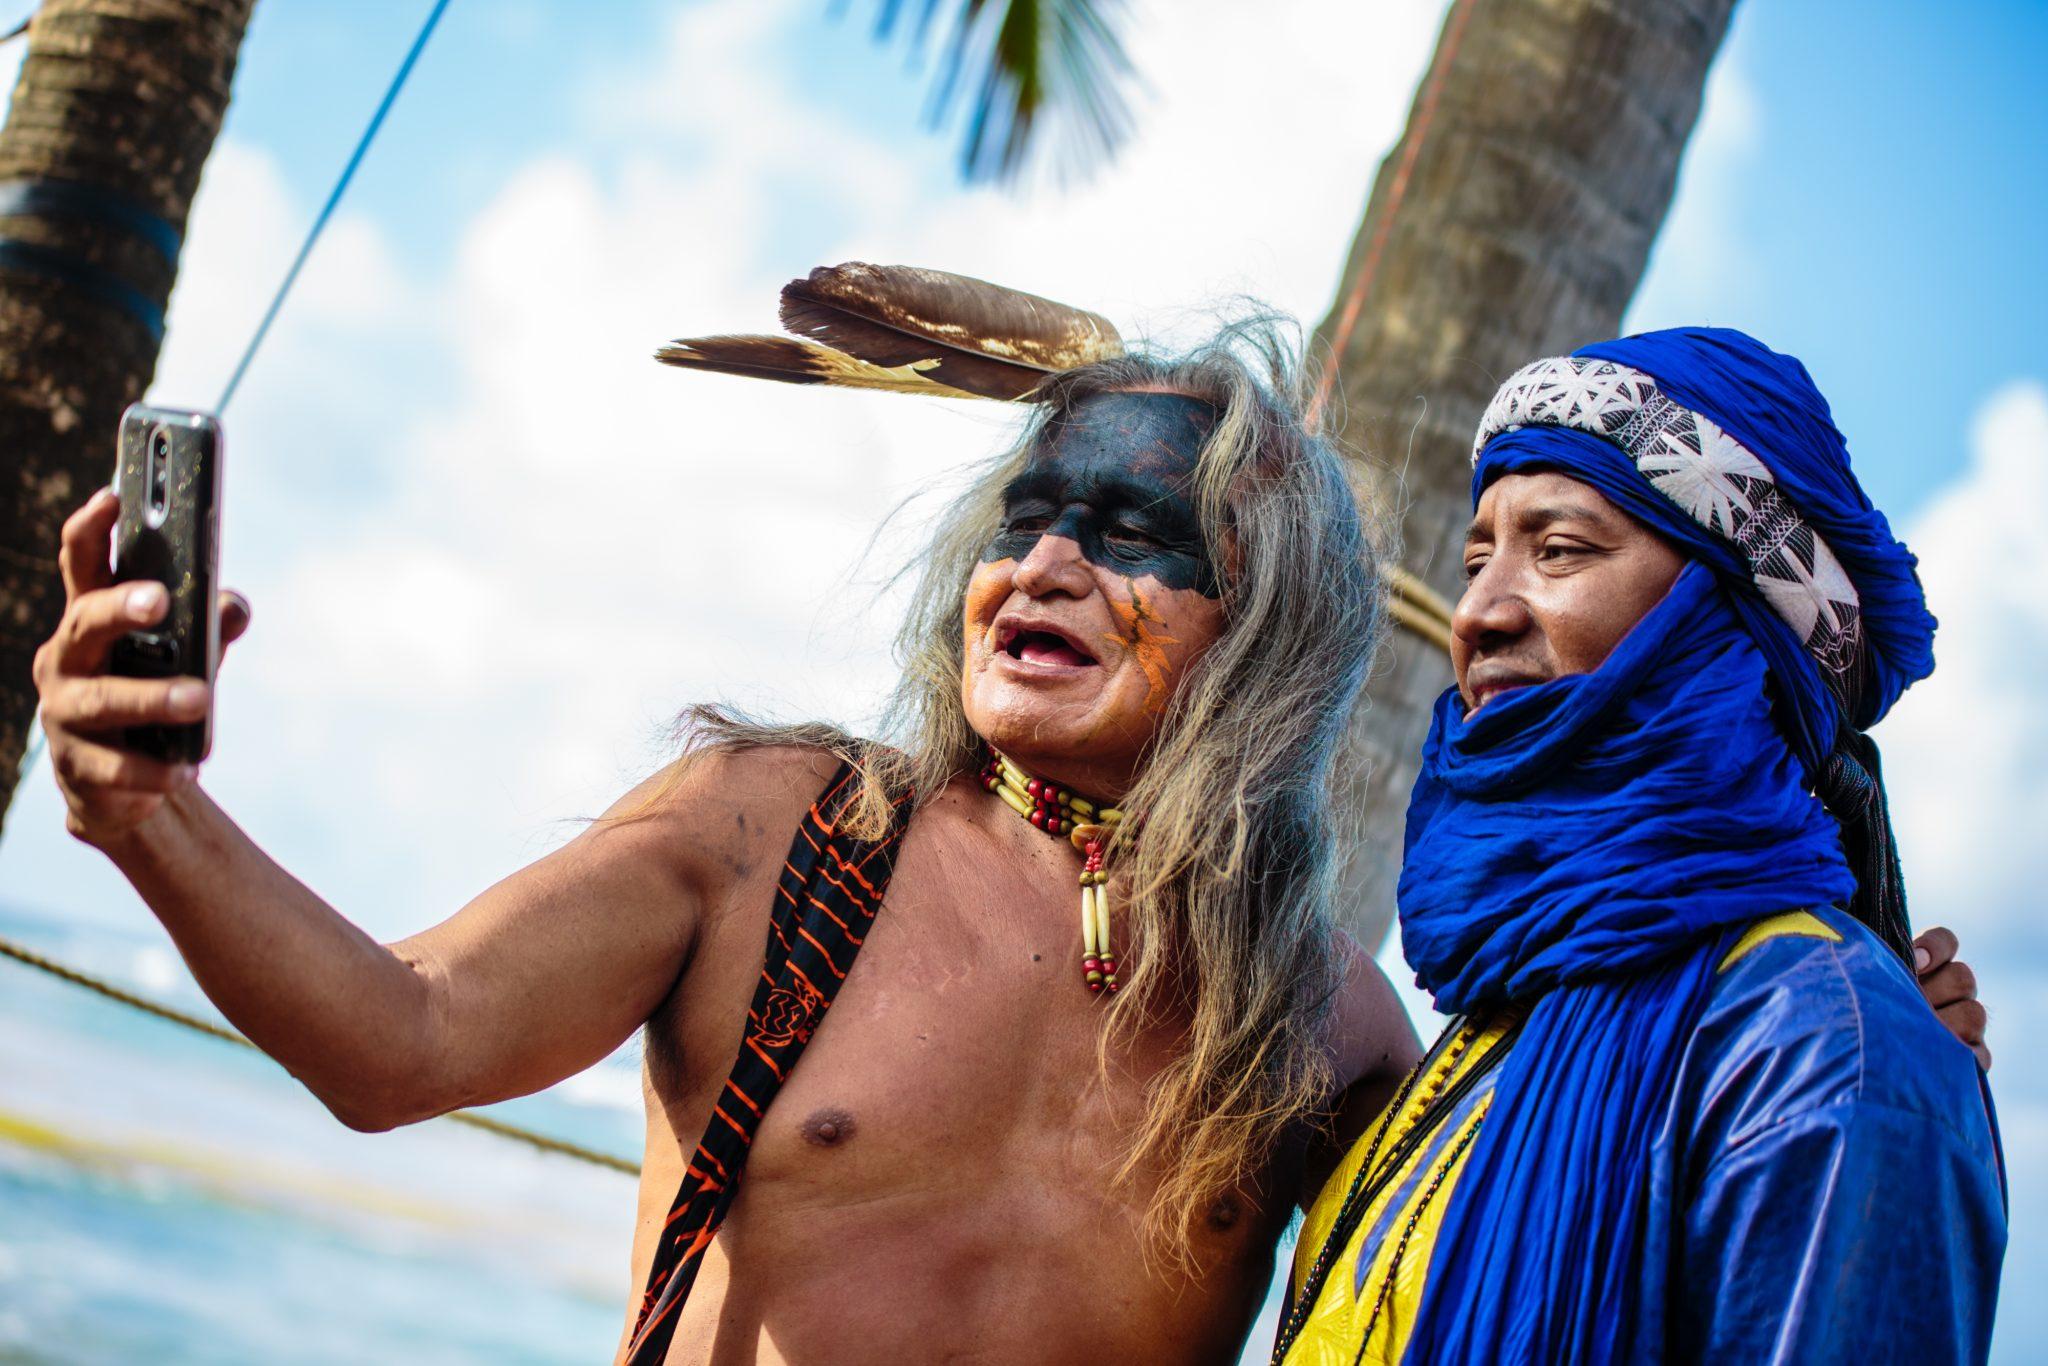 Tribal Gathering, Panama © Lucas Sinclair